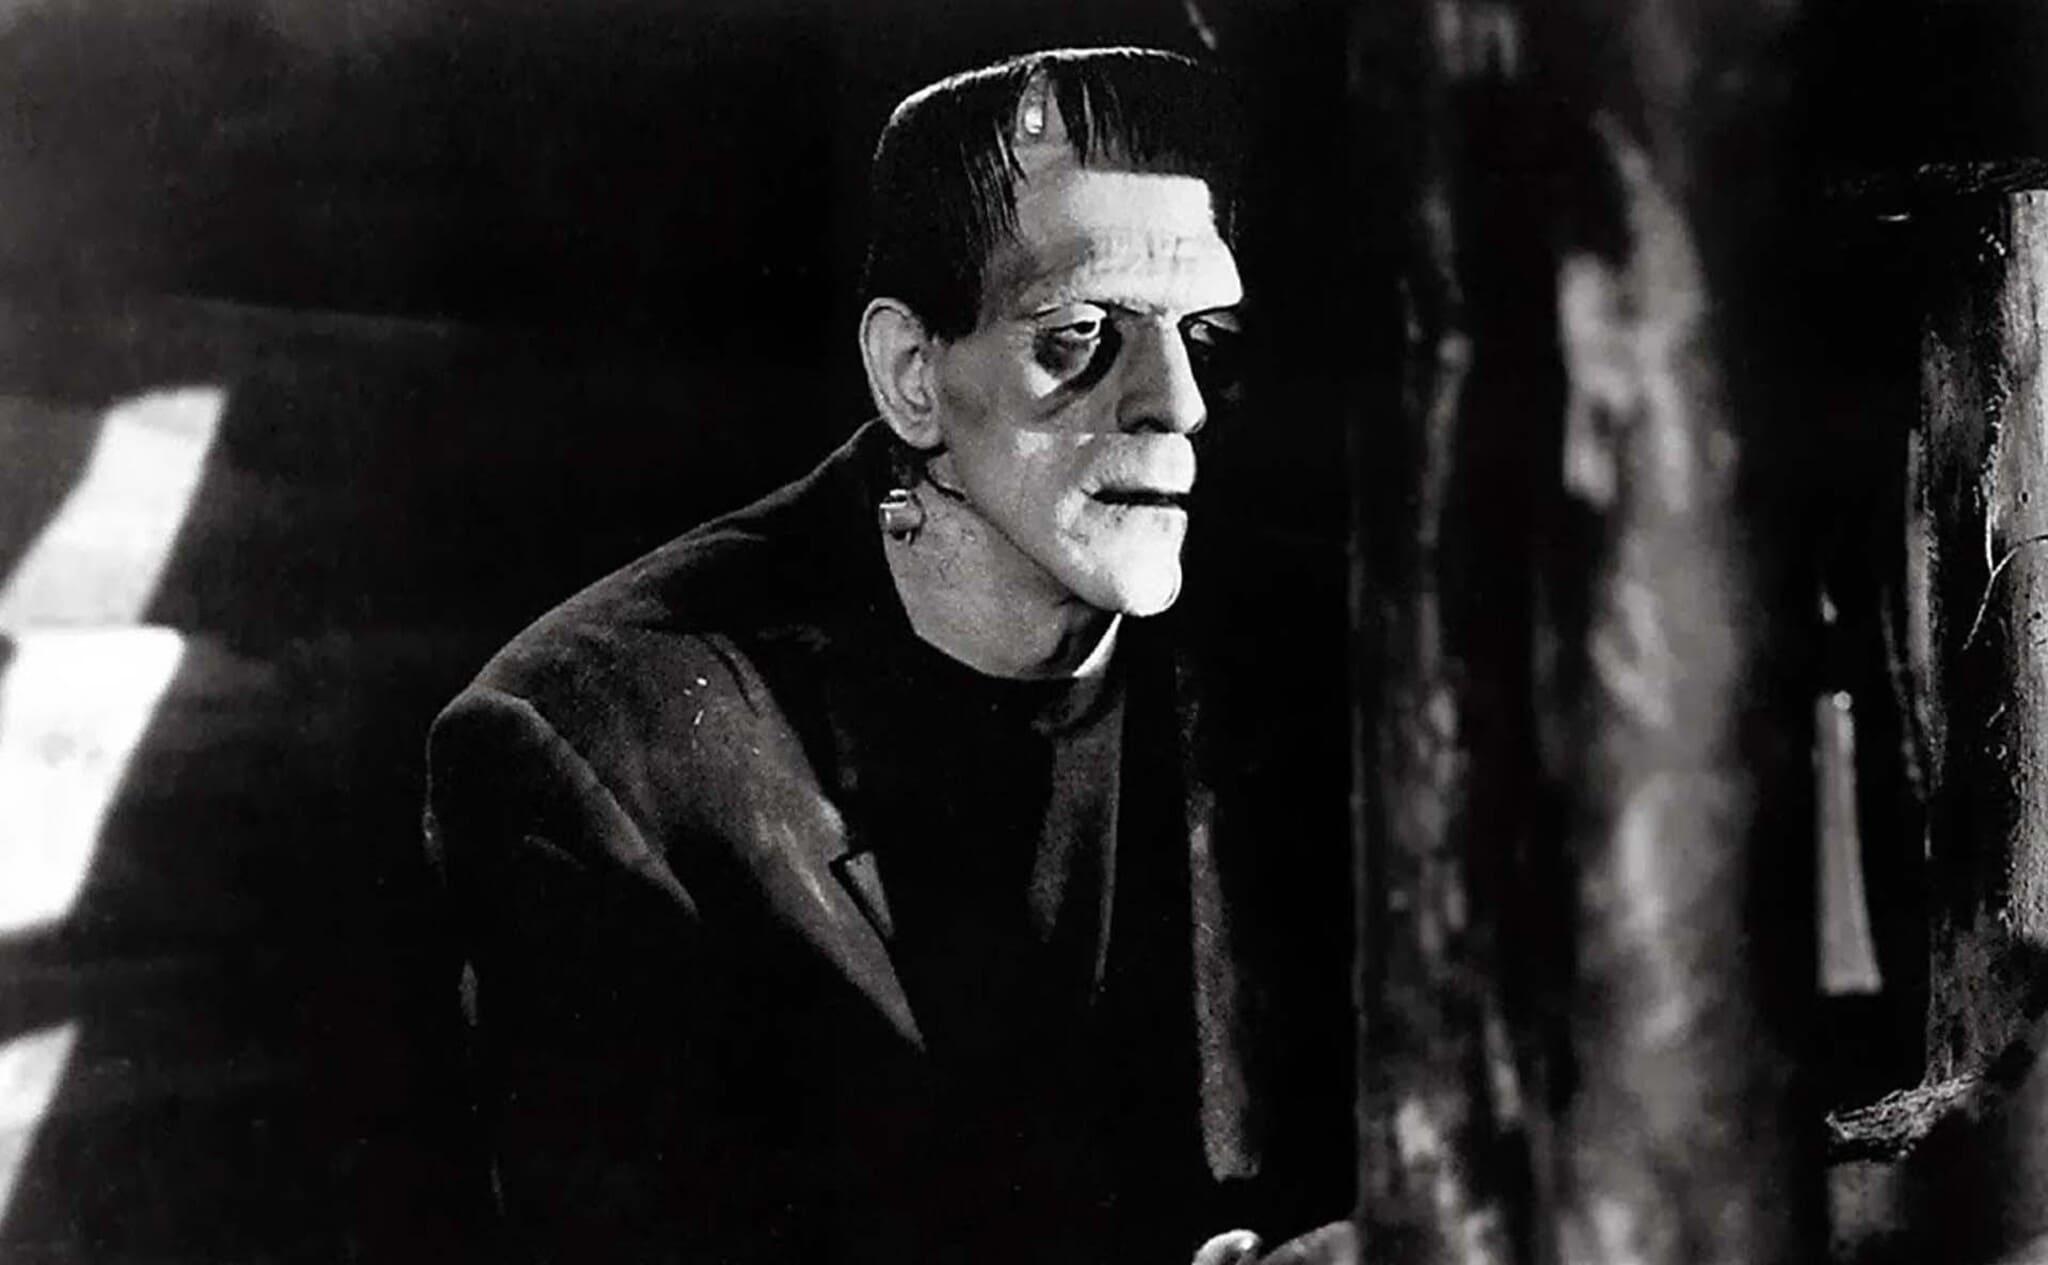 la criatura de Frankenstein